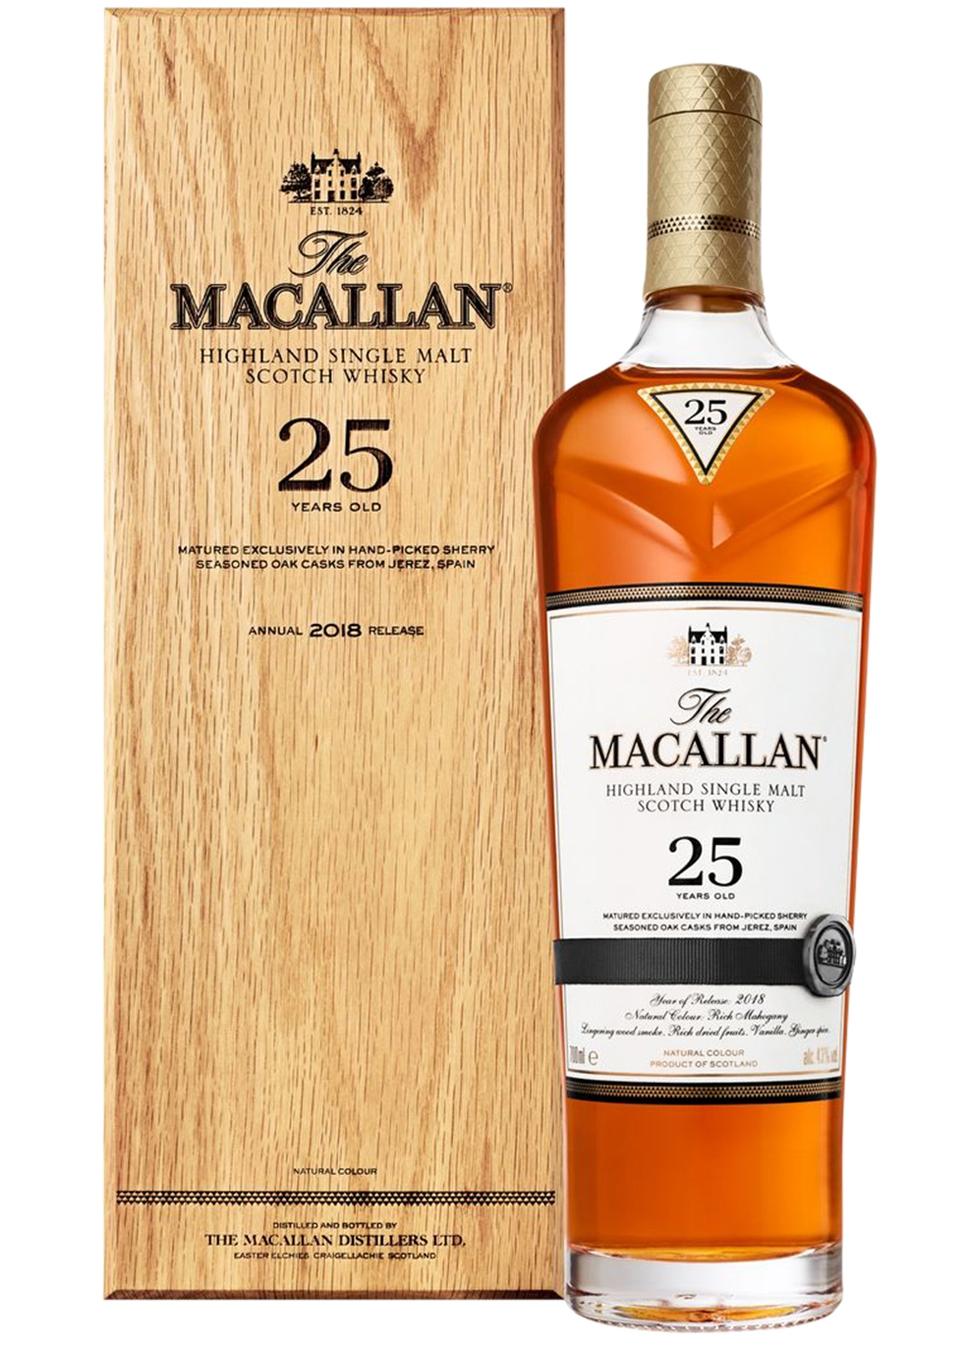 Luxury Whisky - Jack Daniels & Limited Edition - Harvey Nichols